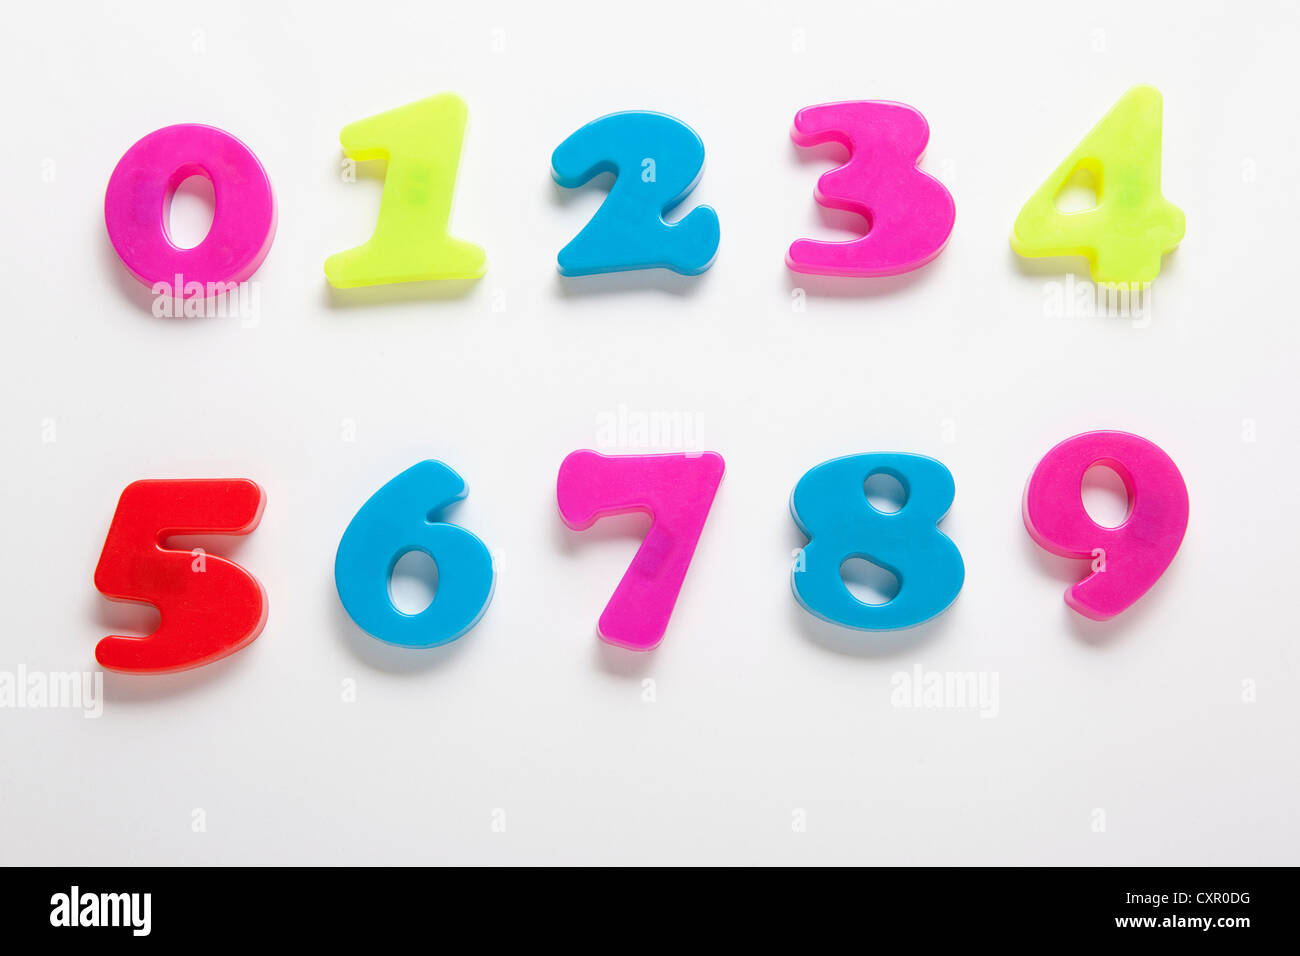 Fridge magnet numbers - Stock Image